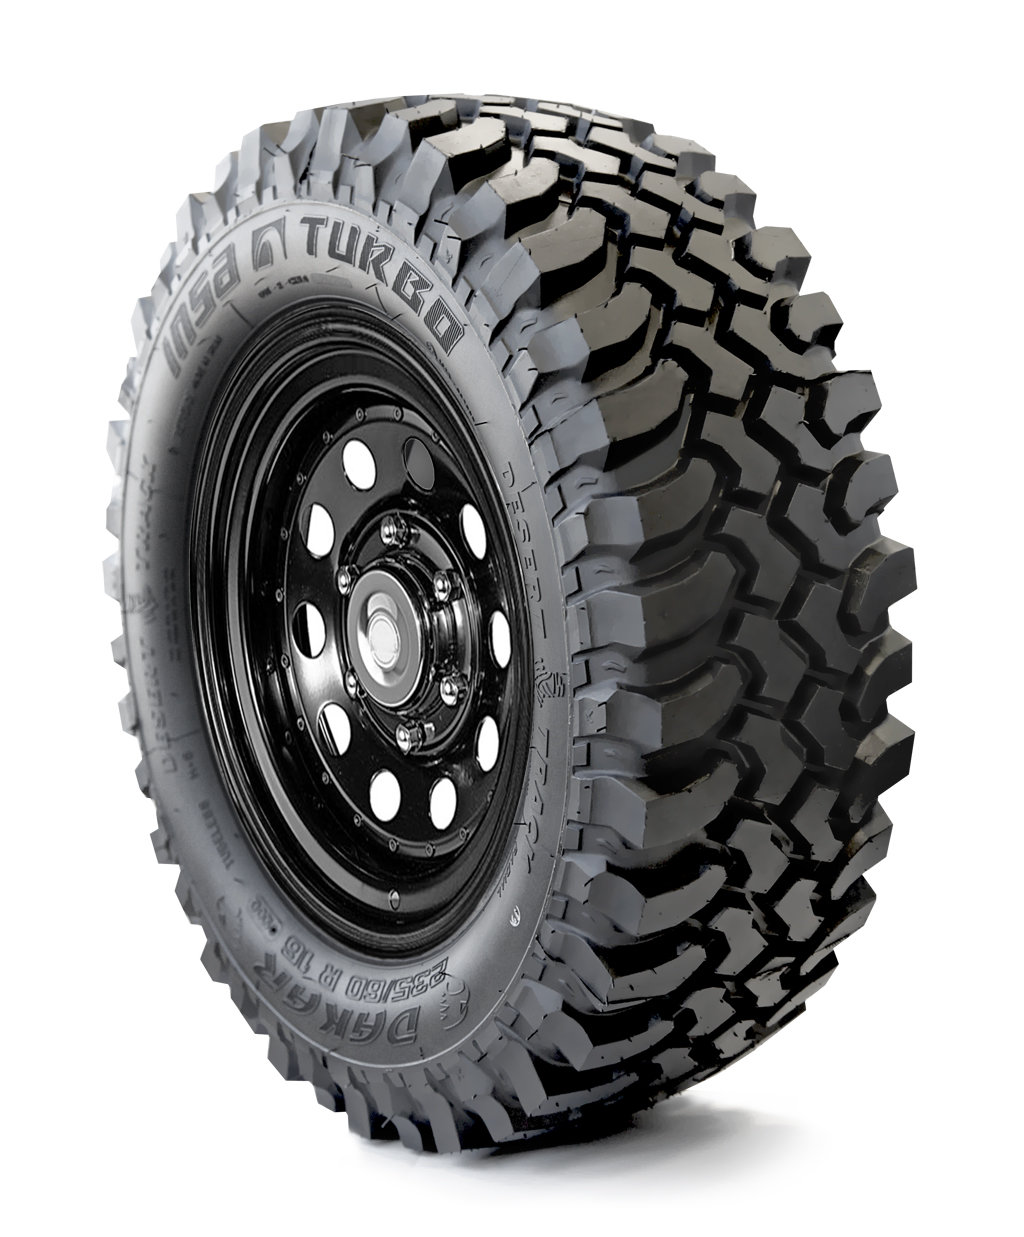 pneu mixte 4x4 pneu 4x4 tout terrain mixte pneu mixte 4x4 265 65 17 dans pneu de voiture. Black Bedroom Furniture Sets. Home Design Ideas